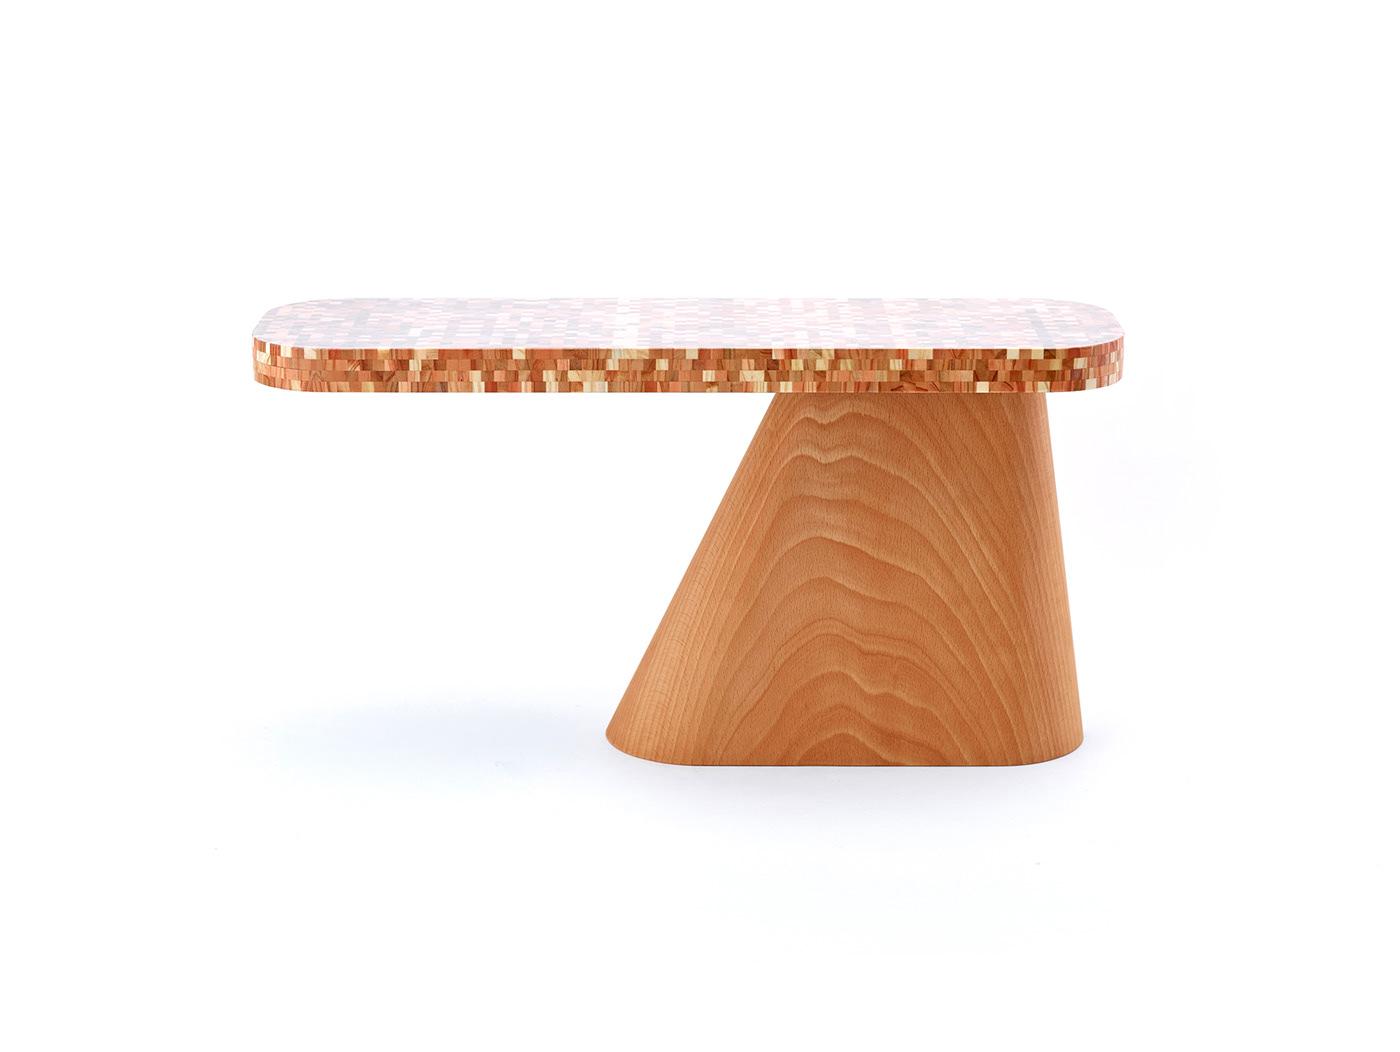 Color Design concept deveropment furniture industrial design  material design milanosalone satellite product design  protptyping Usability wood